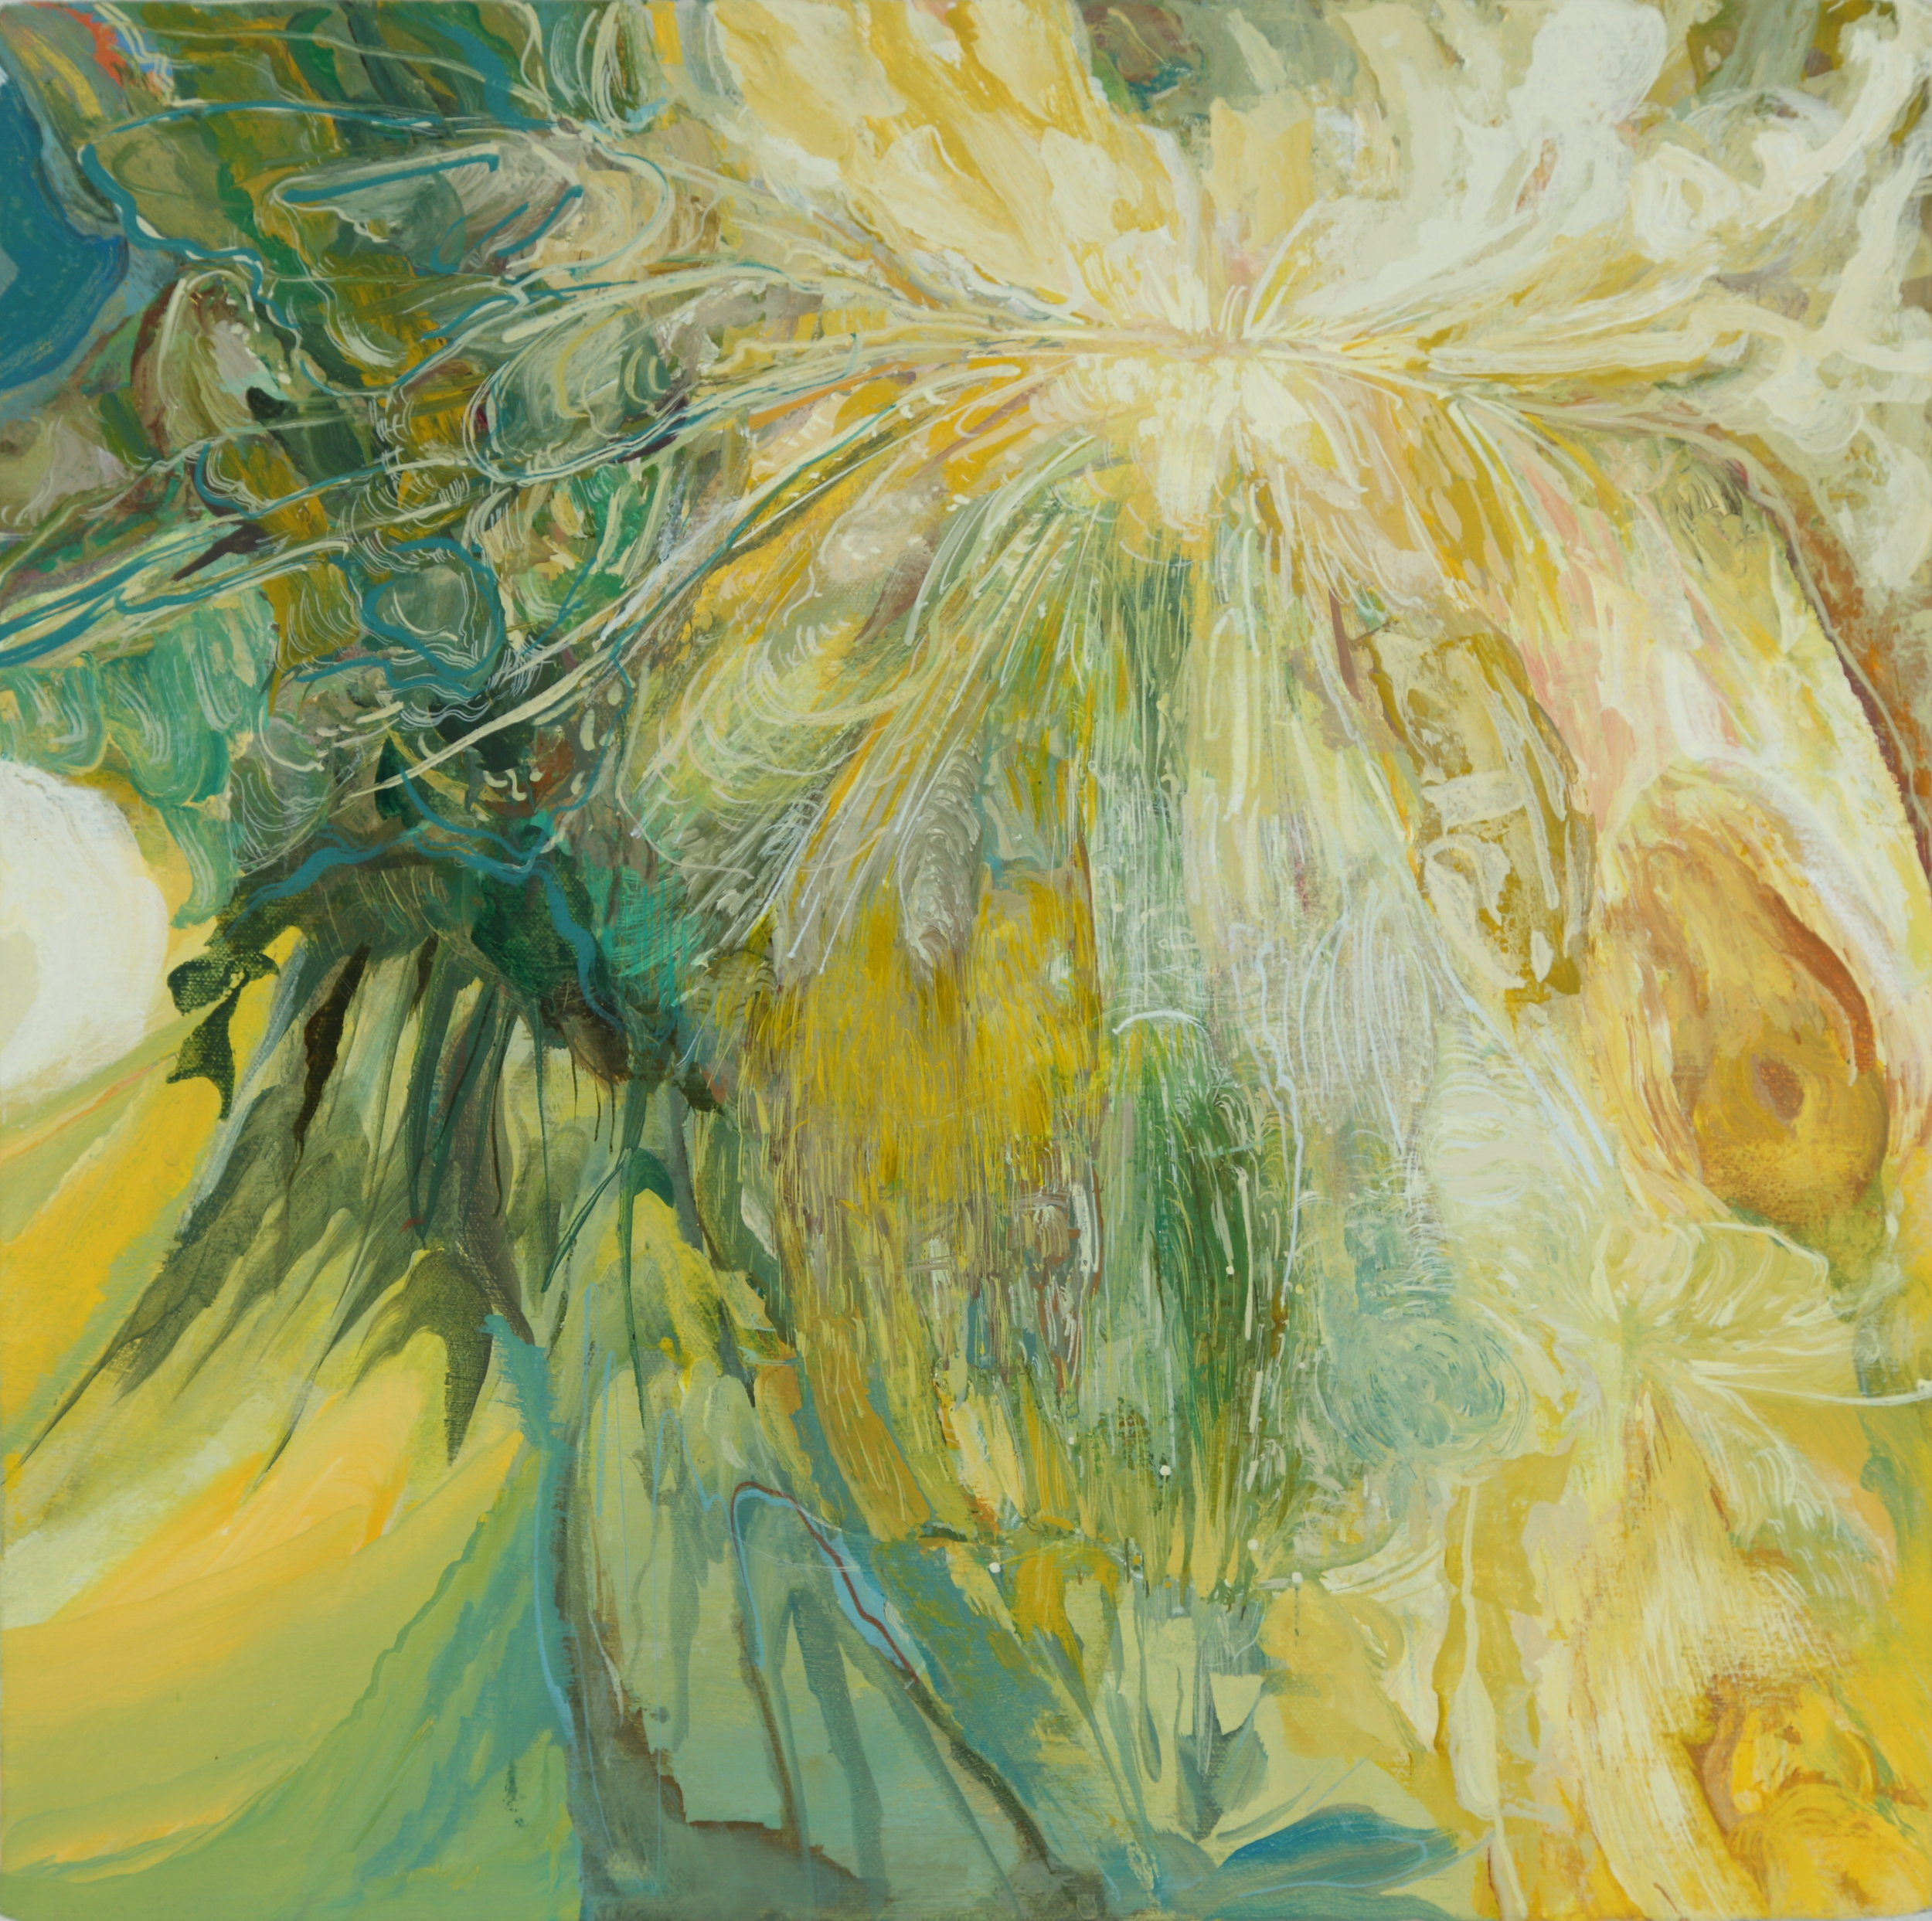 Swirl Lab,  2013, 18 x 18 inches, acrylic on canvas